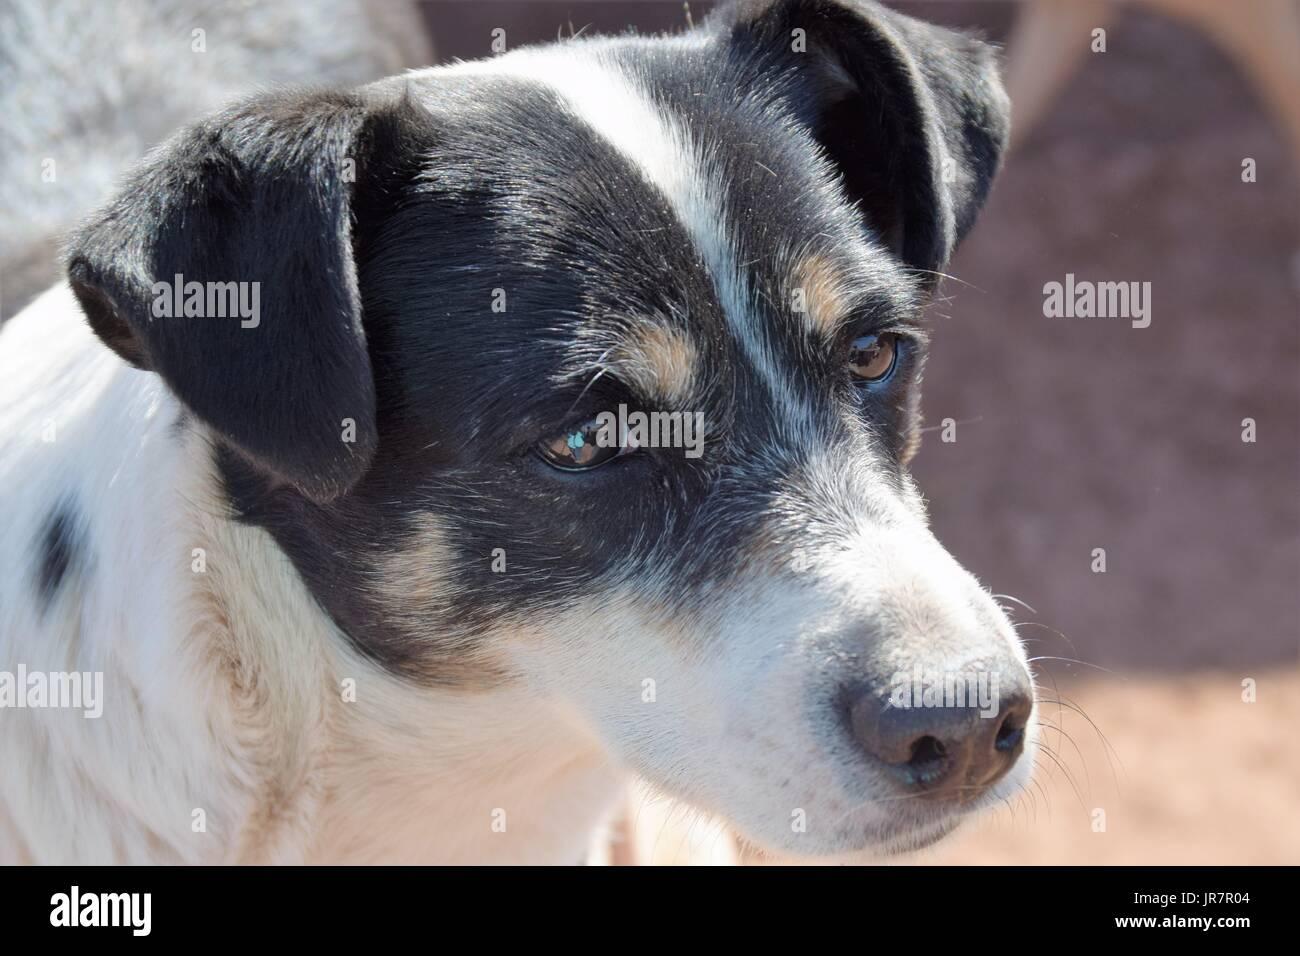 Beautiful shelter dog with soulful eyes in Cuzco, Peru - Stock Image